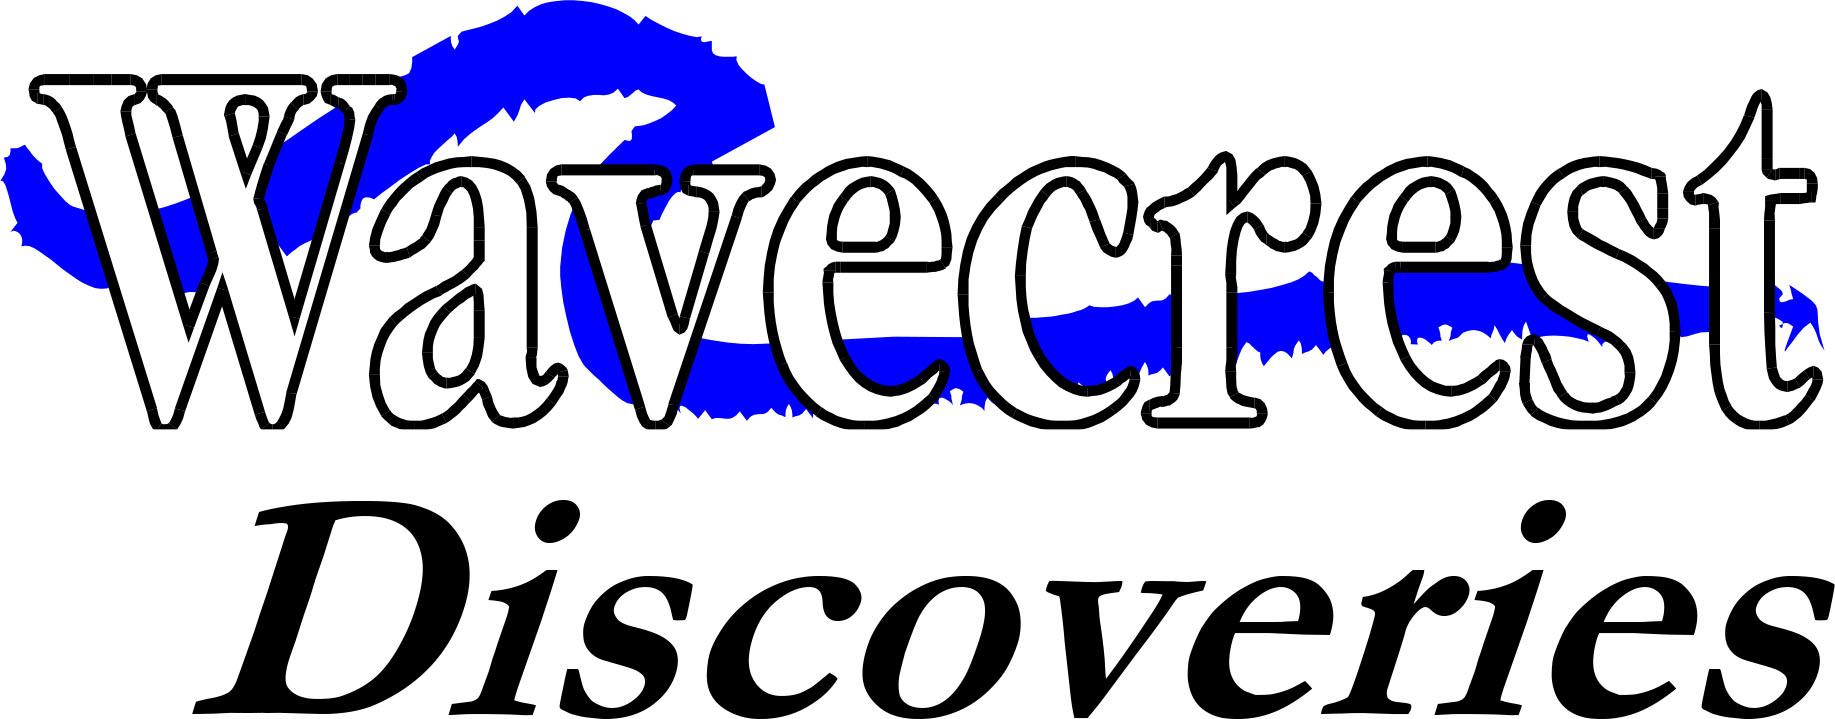 Wavecrest Discoveries logo.jpg